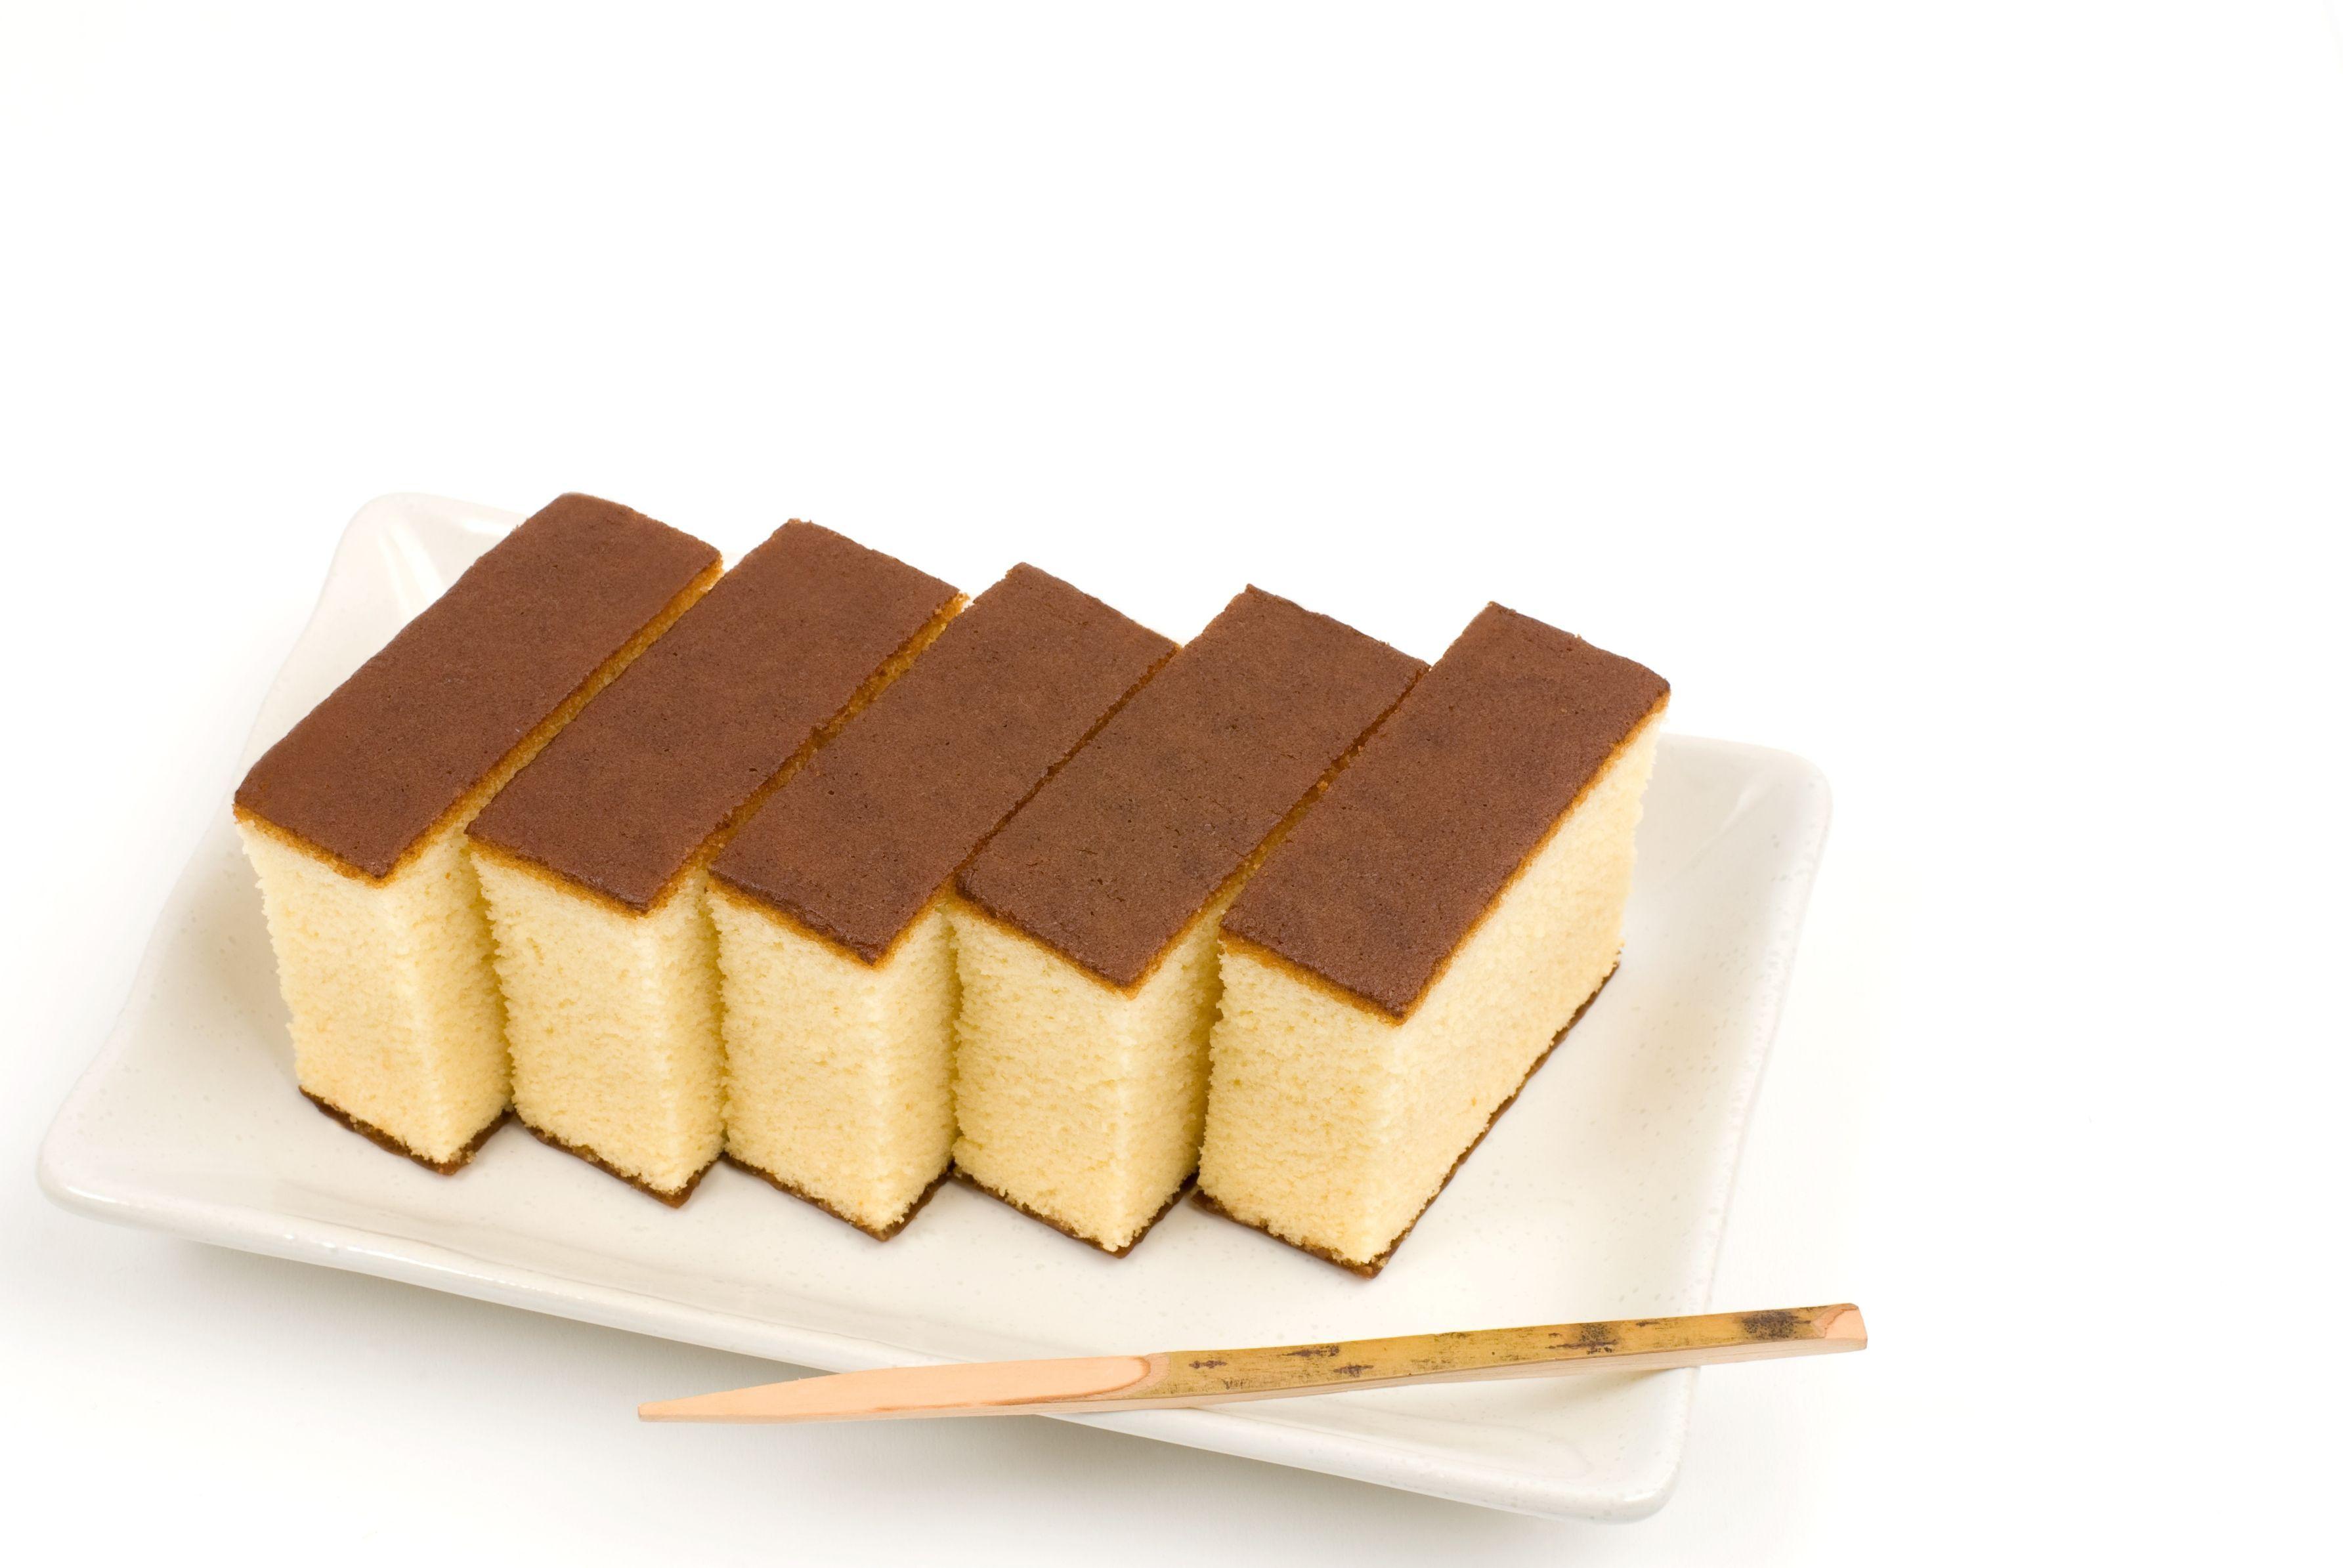 Japanese Sponge Cake Recipe Kasutera